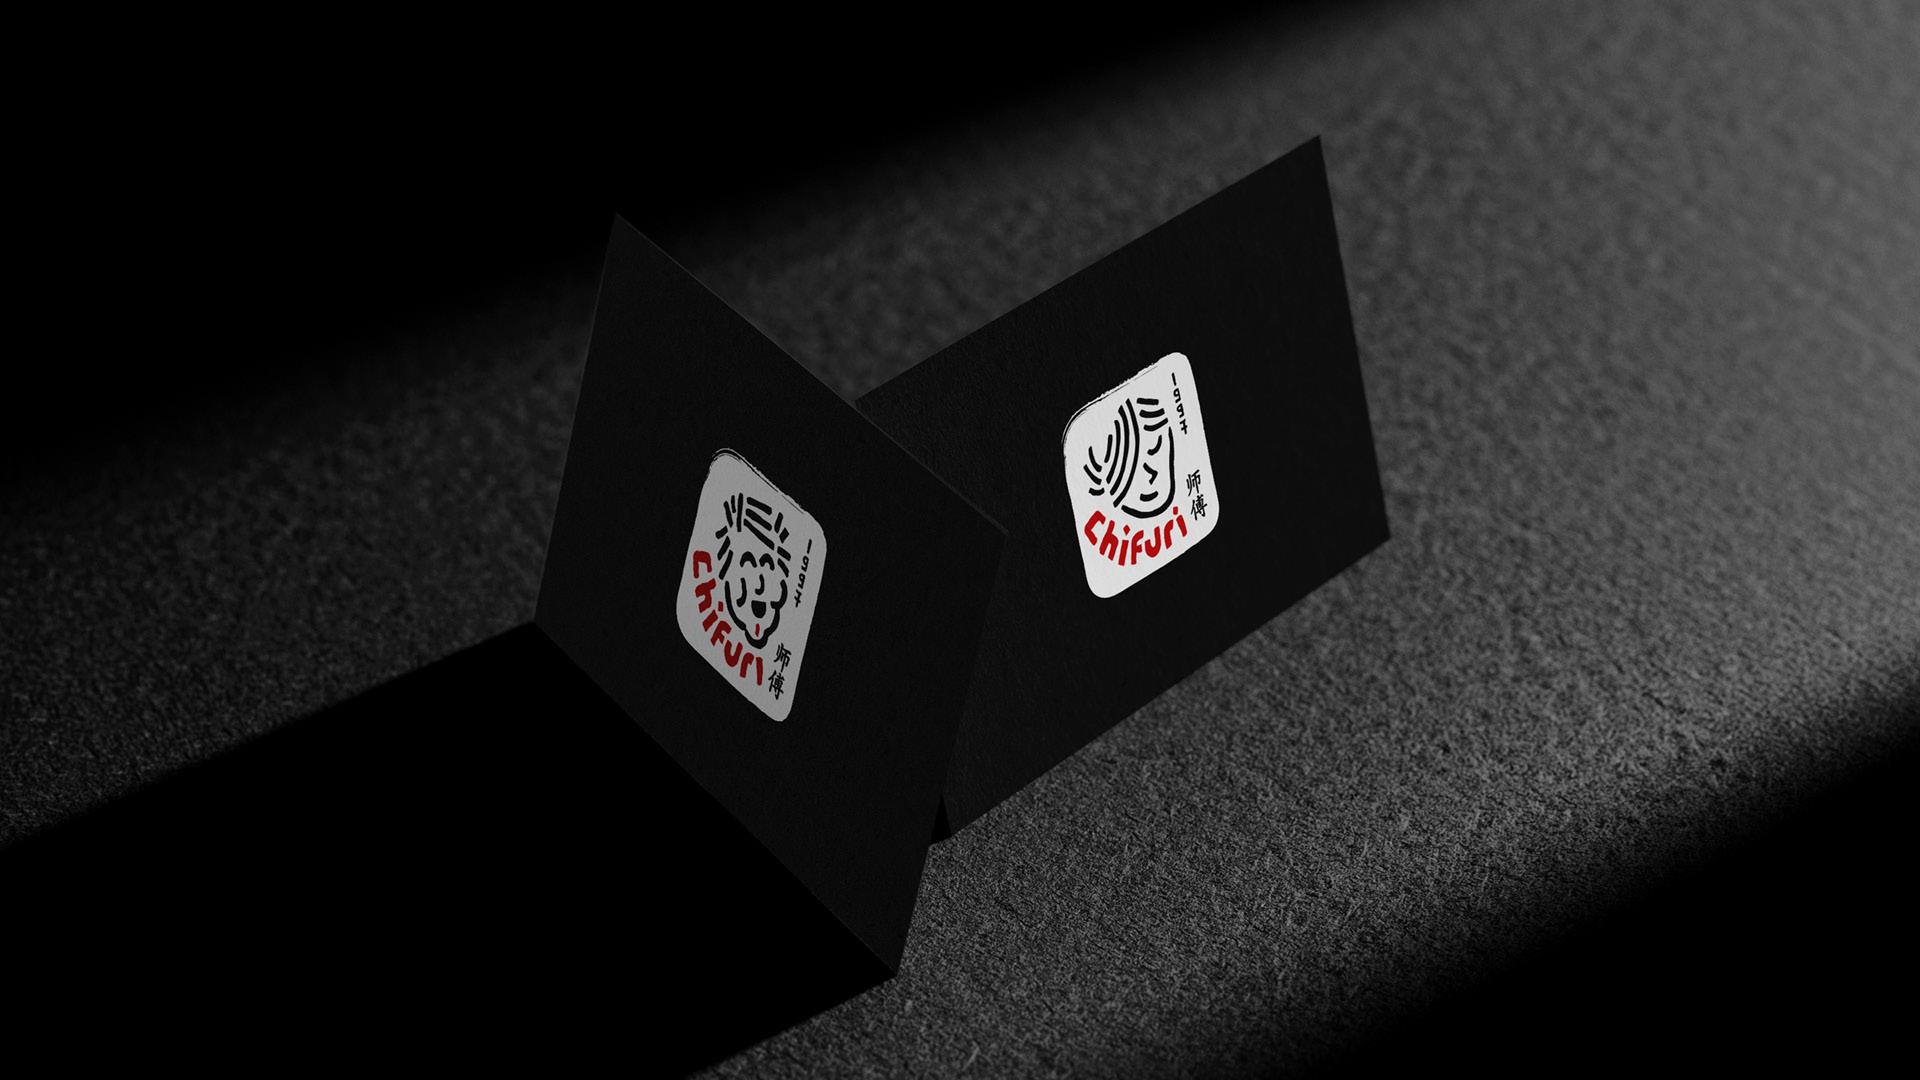 CHIFURI-business-card